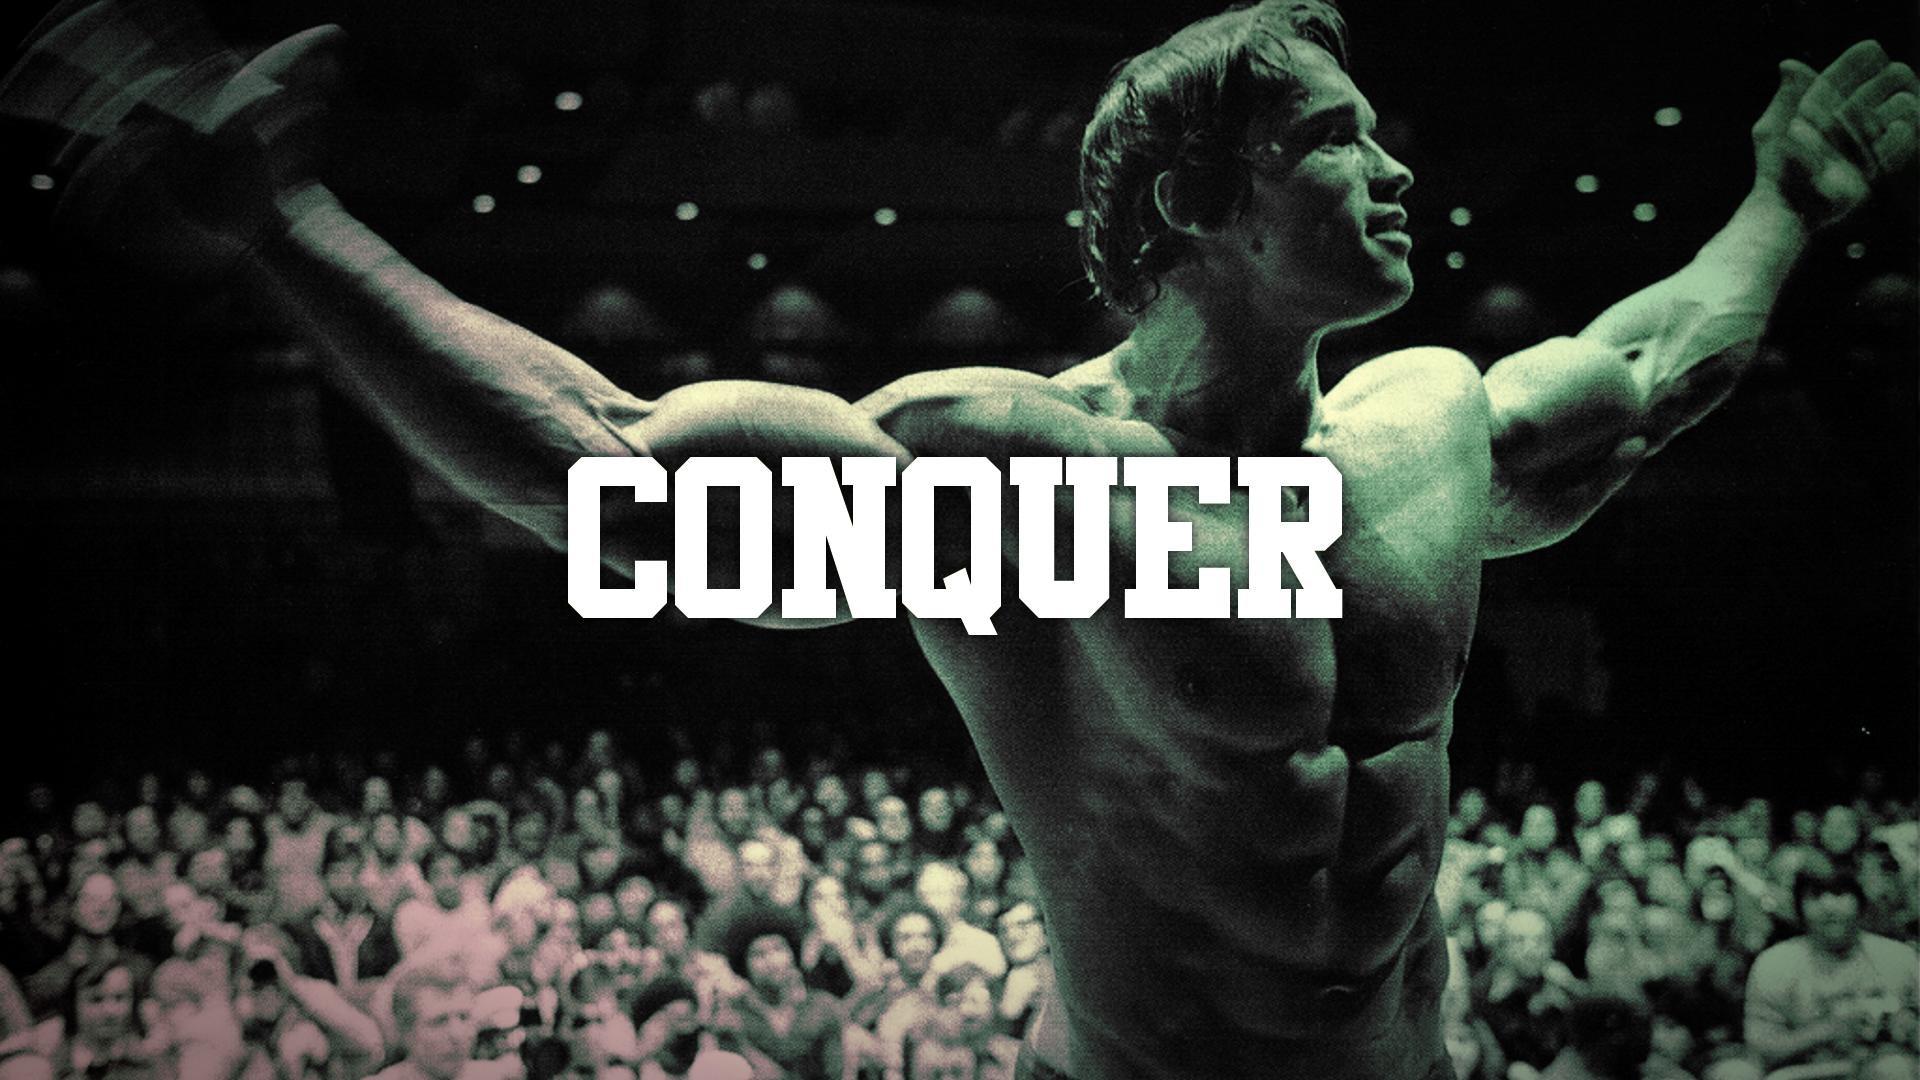 Arnold Schwarzenegger Conquer Muscle Bodybuilding wallpaper